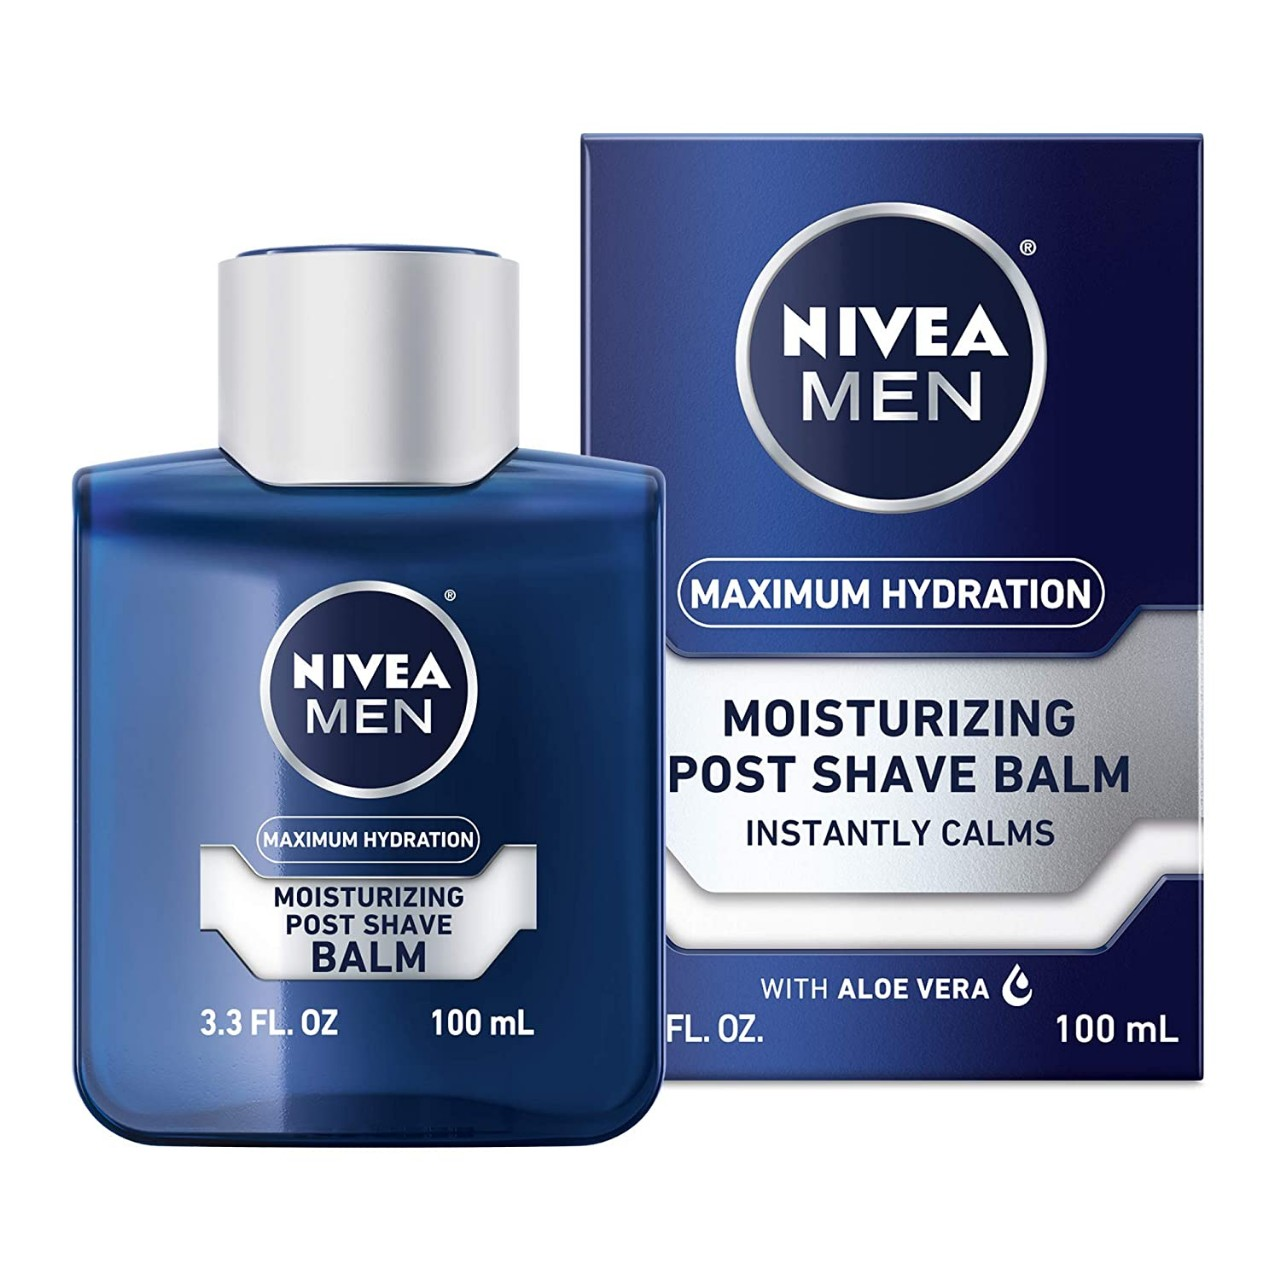 NIVEA Men Maximum Hydration Moisturizing Post Shave Balm - No Greasy Feel - 3.3 fl. oz Bottle